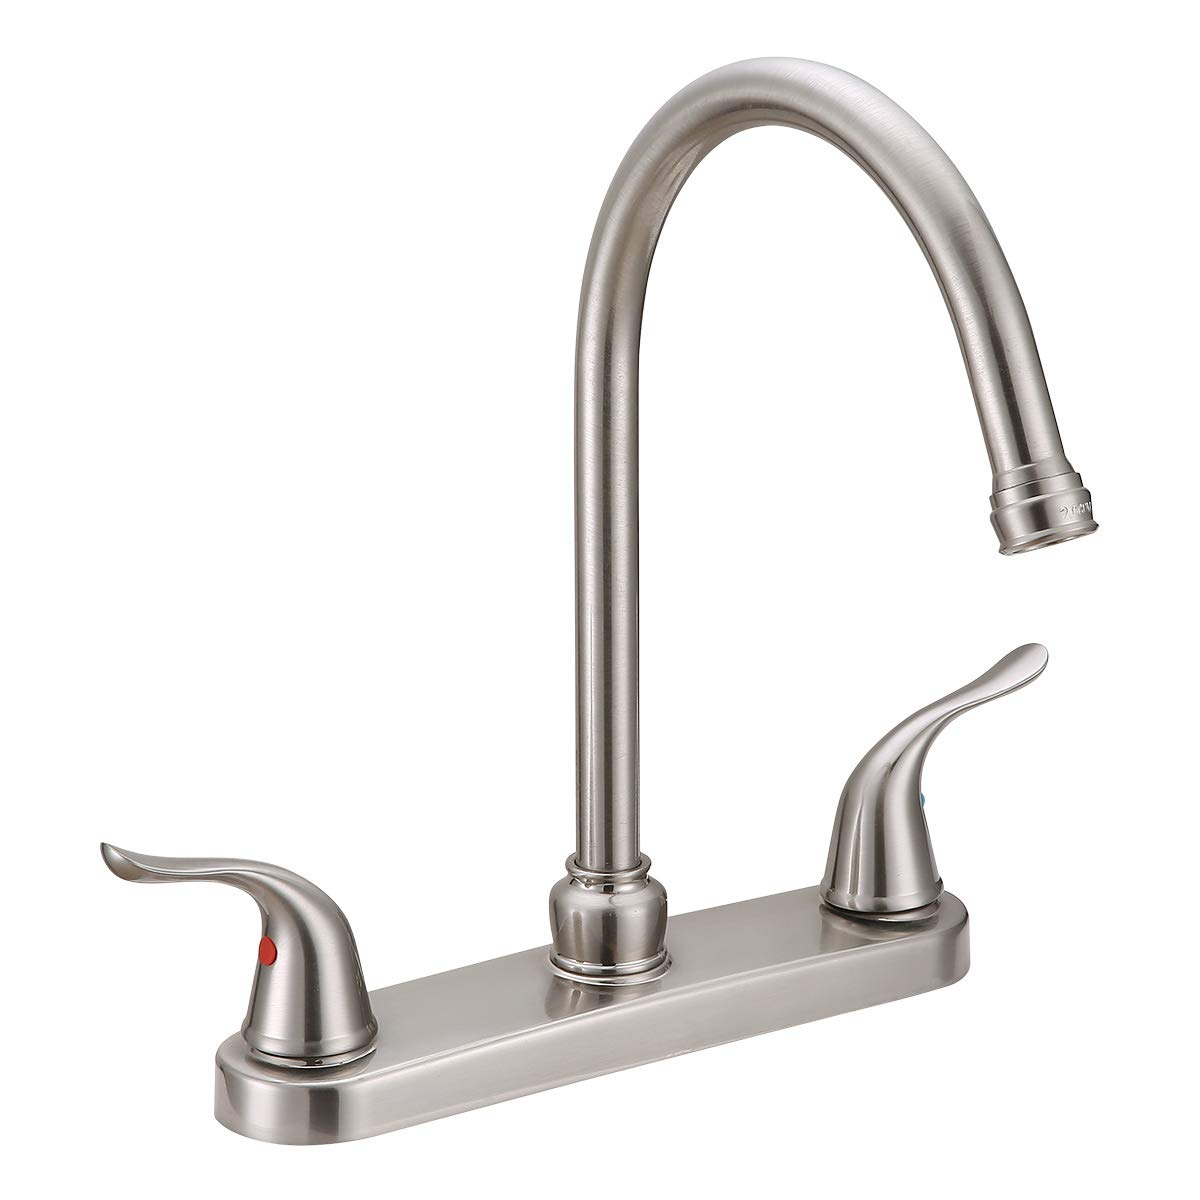 EZ-FLO 10773 10199 Kitchen Faucet Two Handles, Brushed Nickel